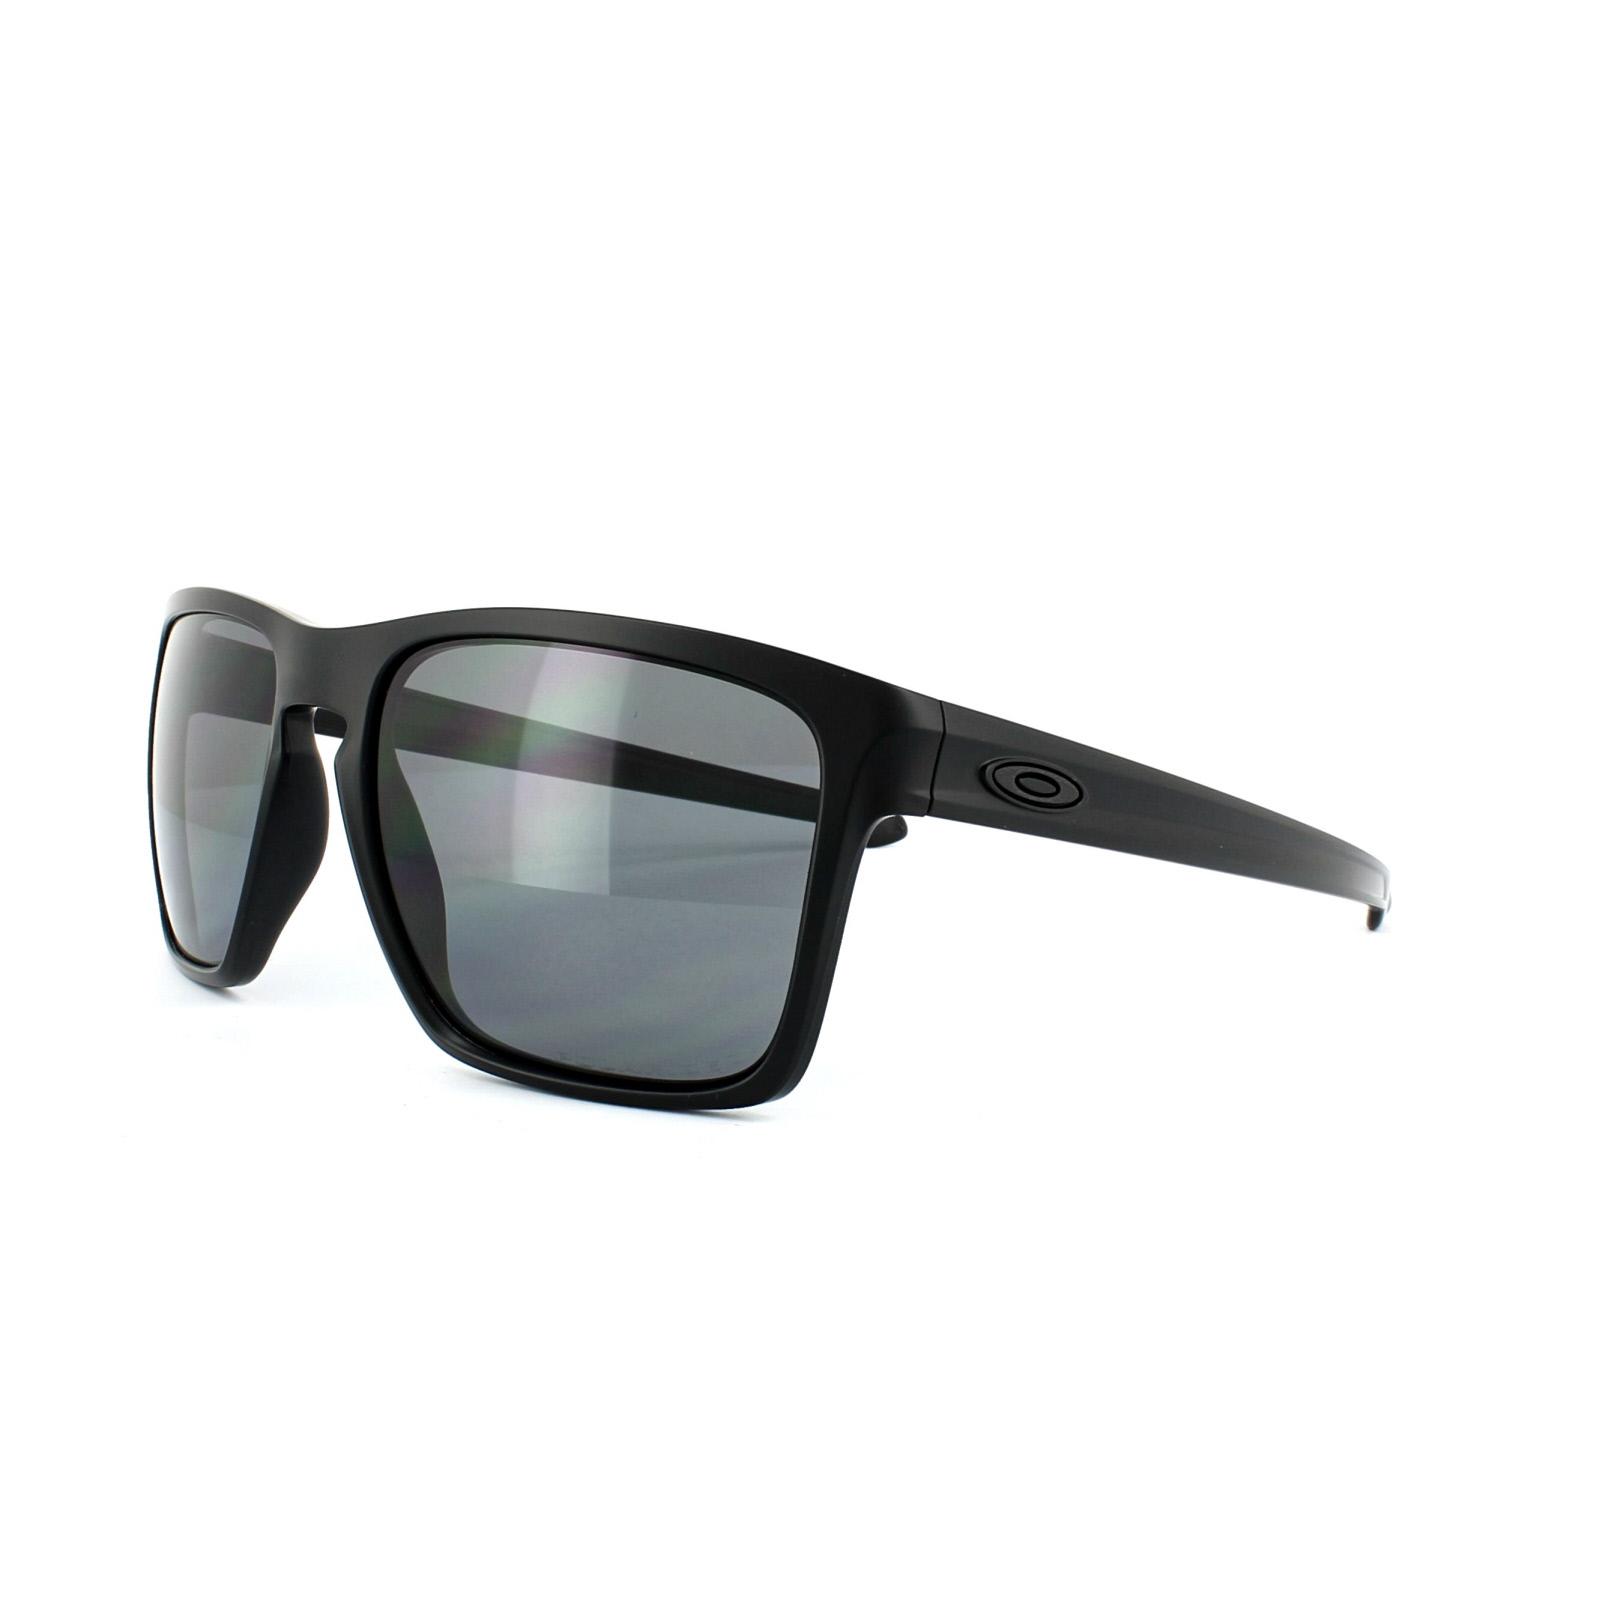 45bf3caa3c0 Cheap Oakley Sliver XL Sunglasses - Discounted Sunglasses